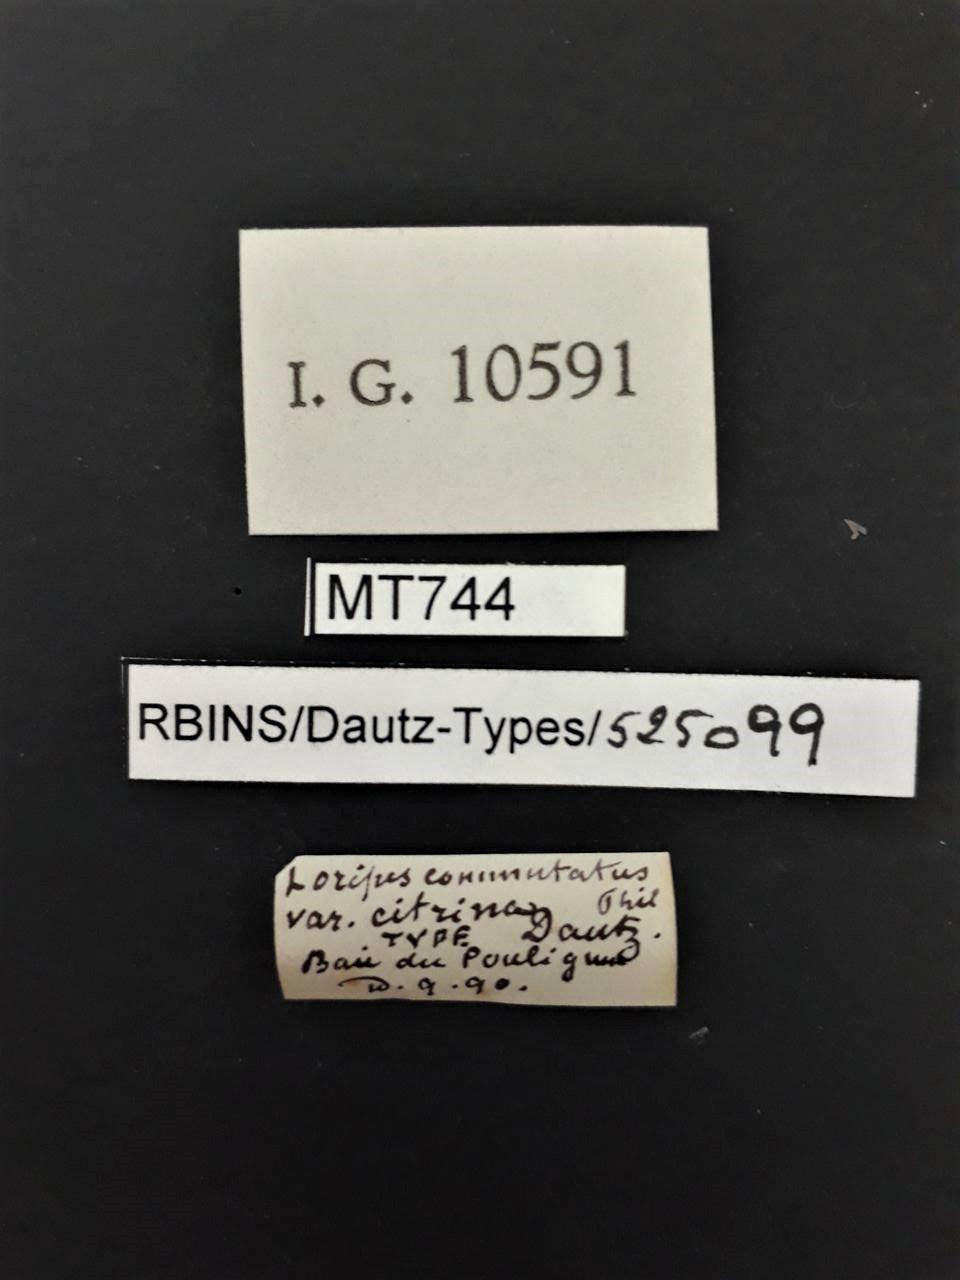 BE-RBINS-INV TYPE MT 744 Loripes commutatus var. cintrina LABELS.jpg